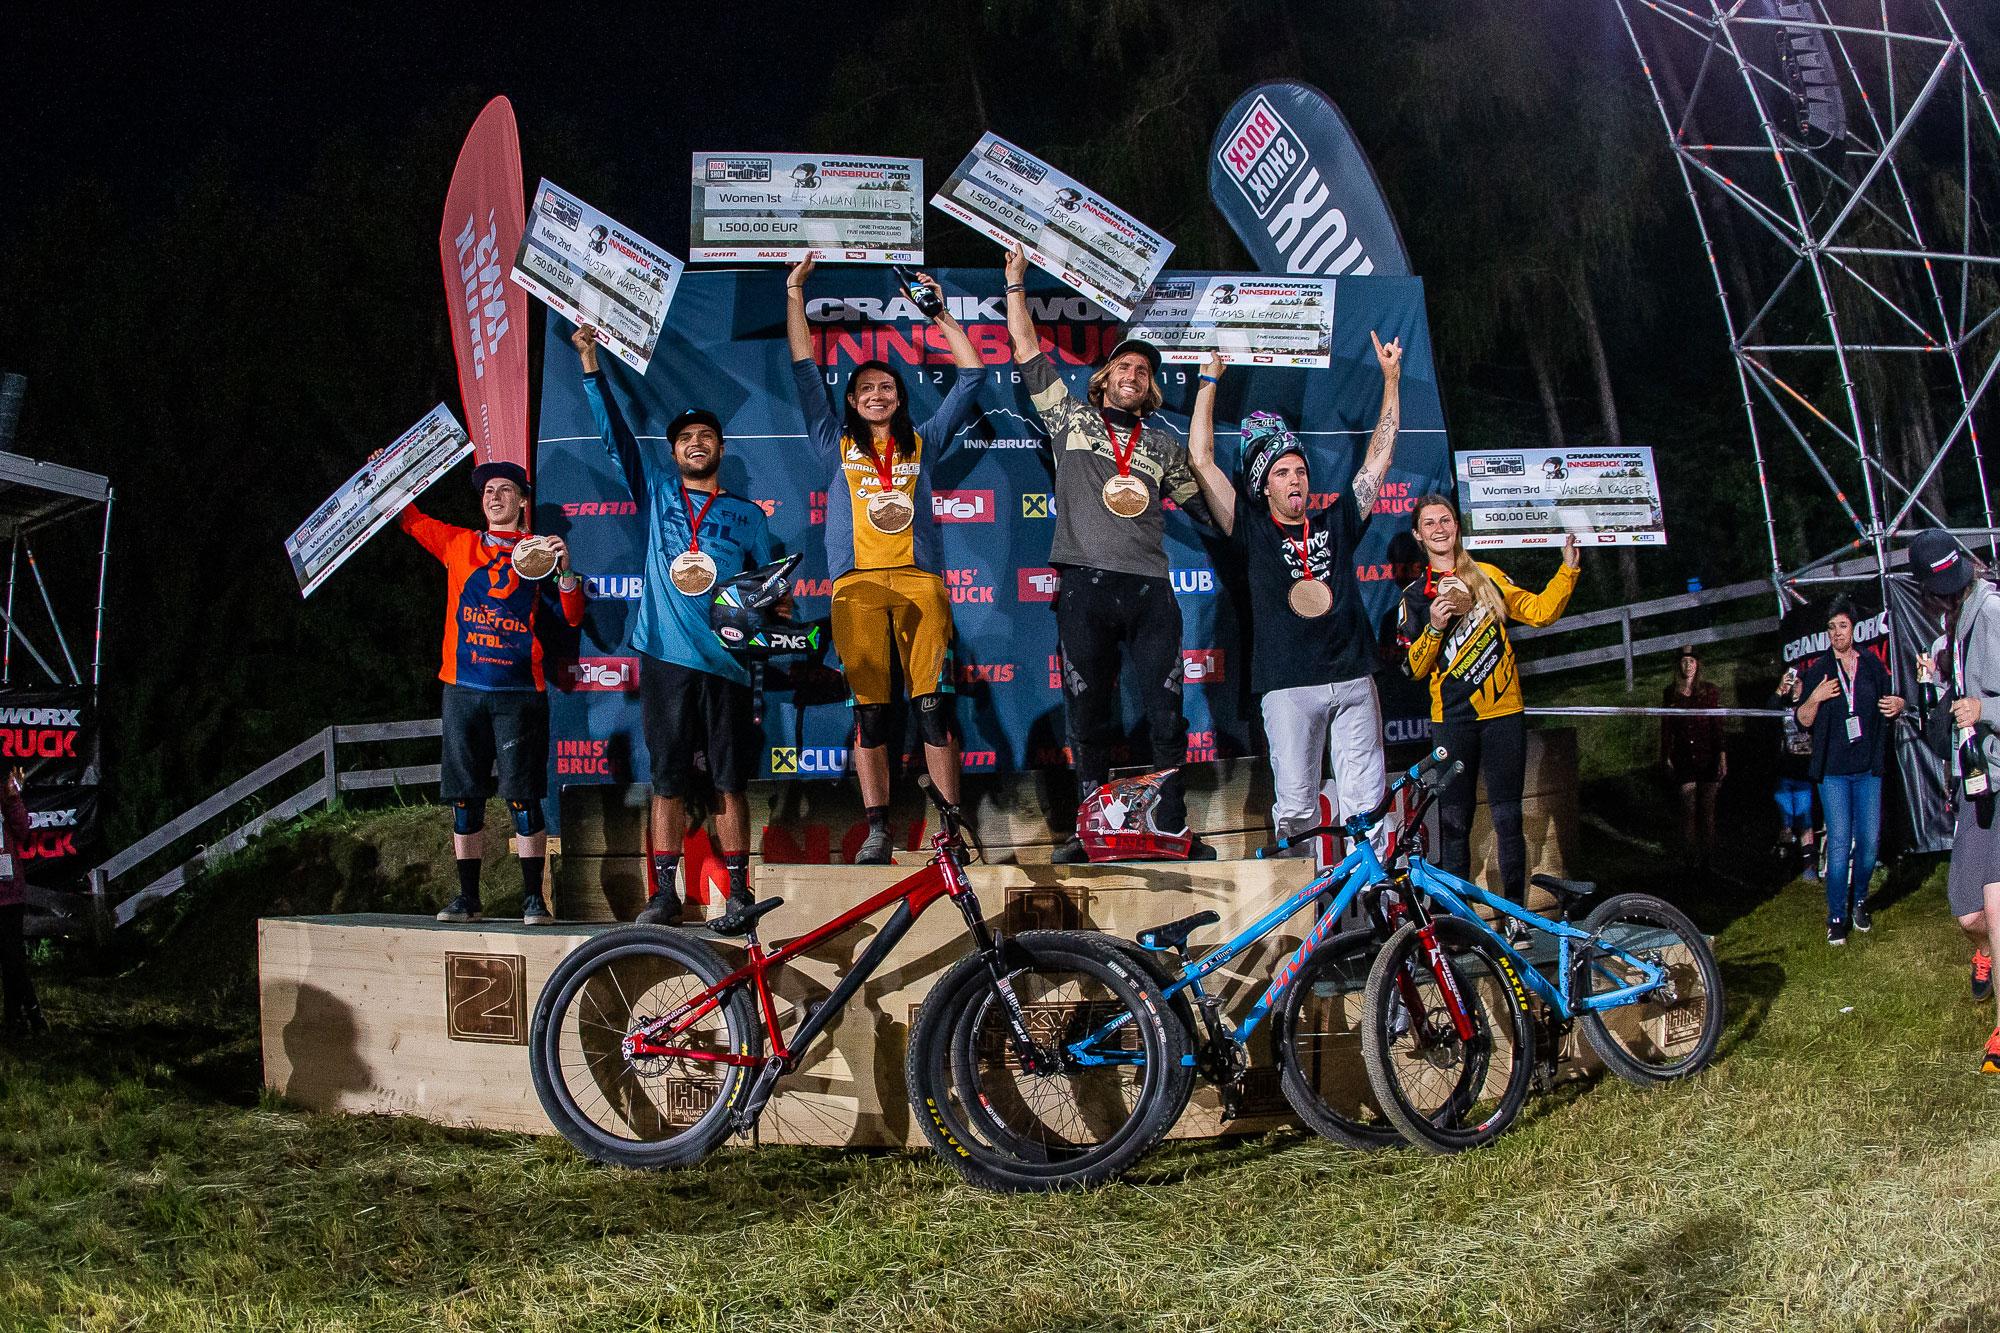 RockShox Innsbruck Pump Track Challenge